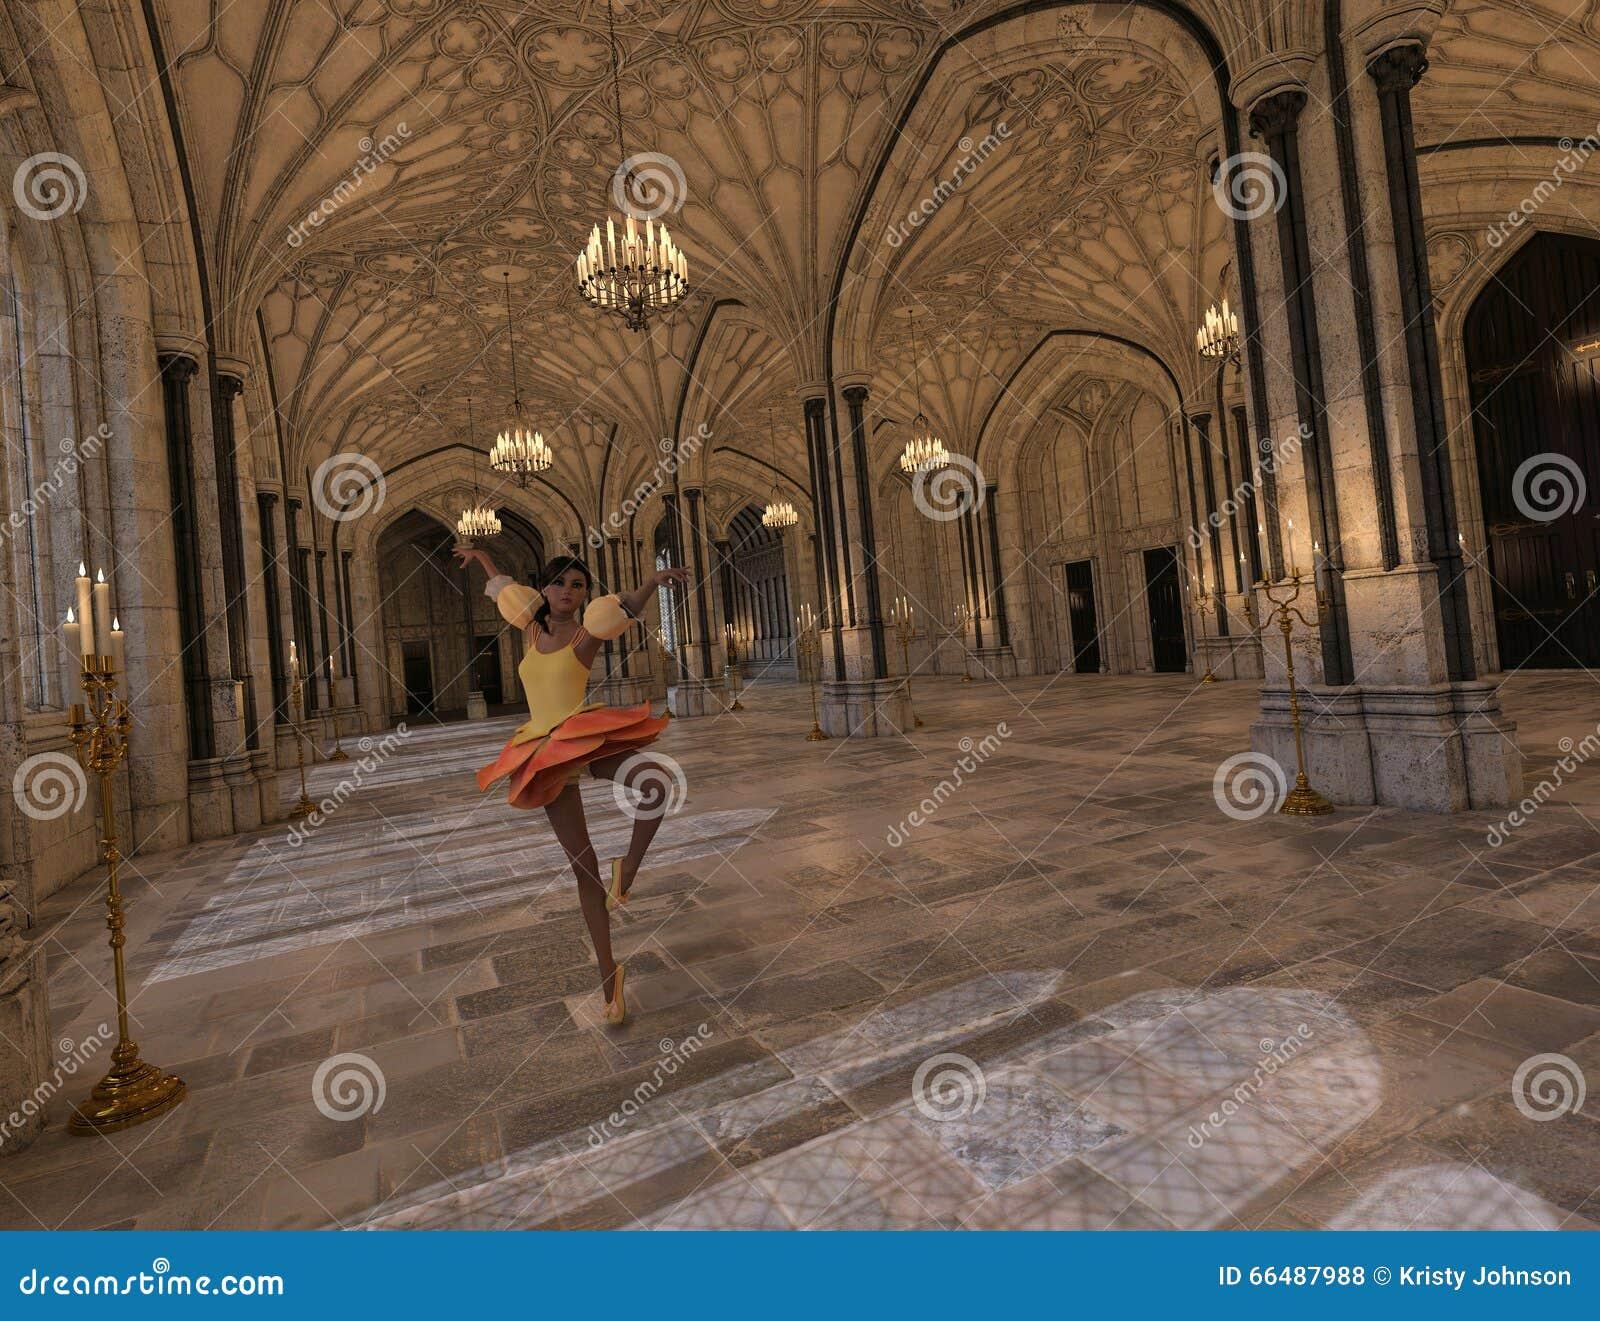 Ballando nella sala da ballo